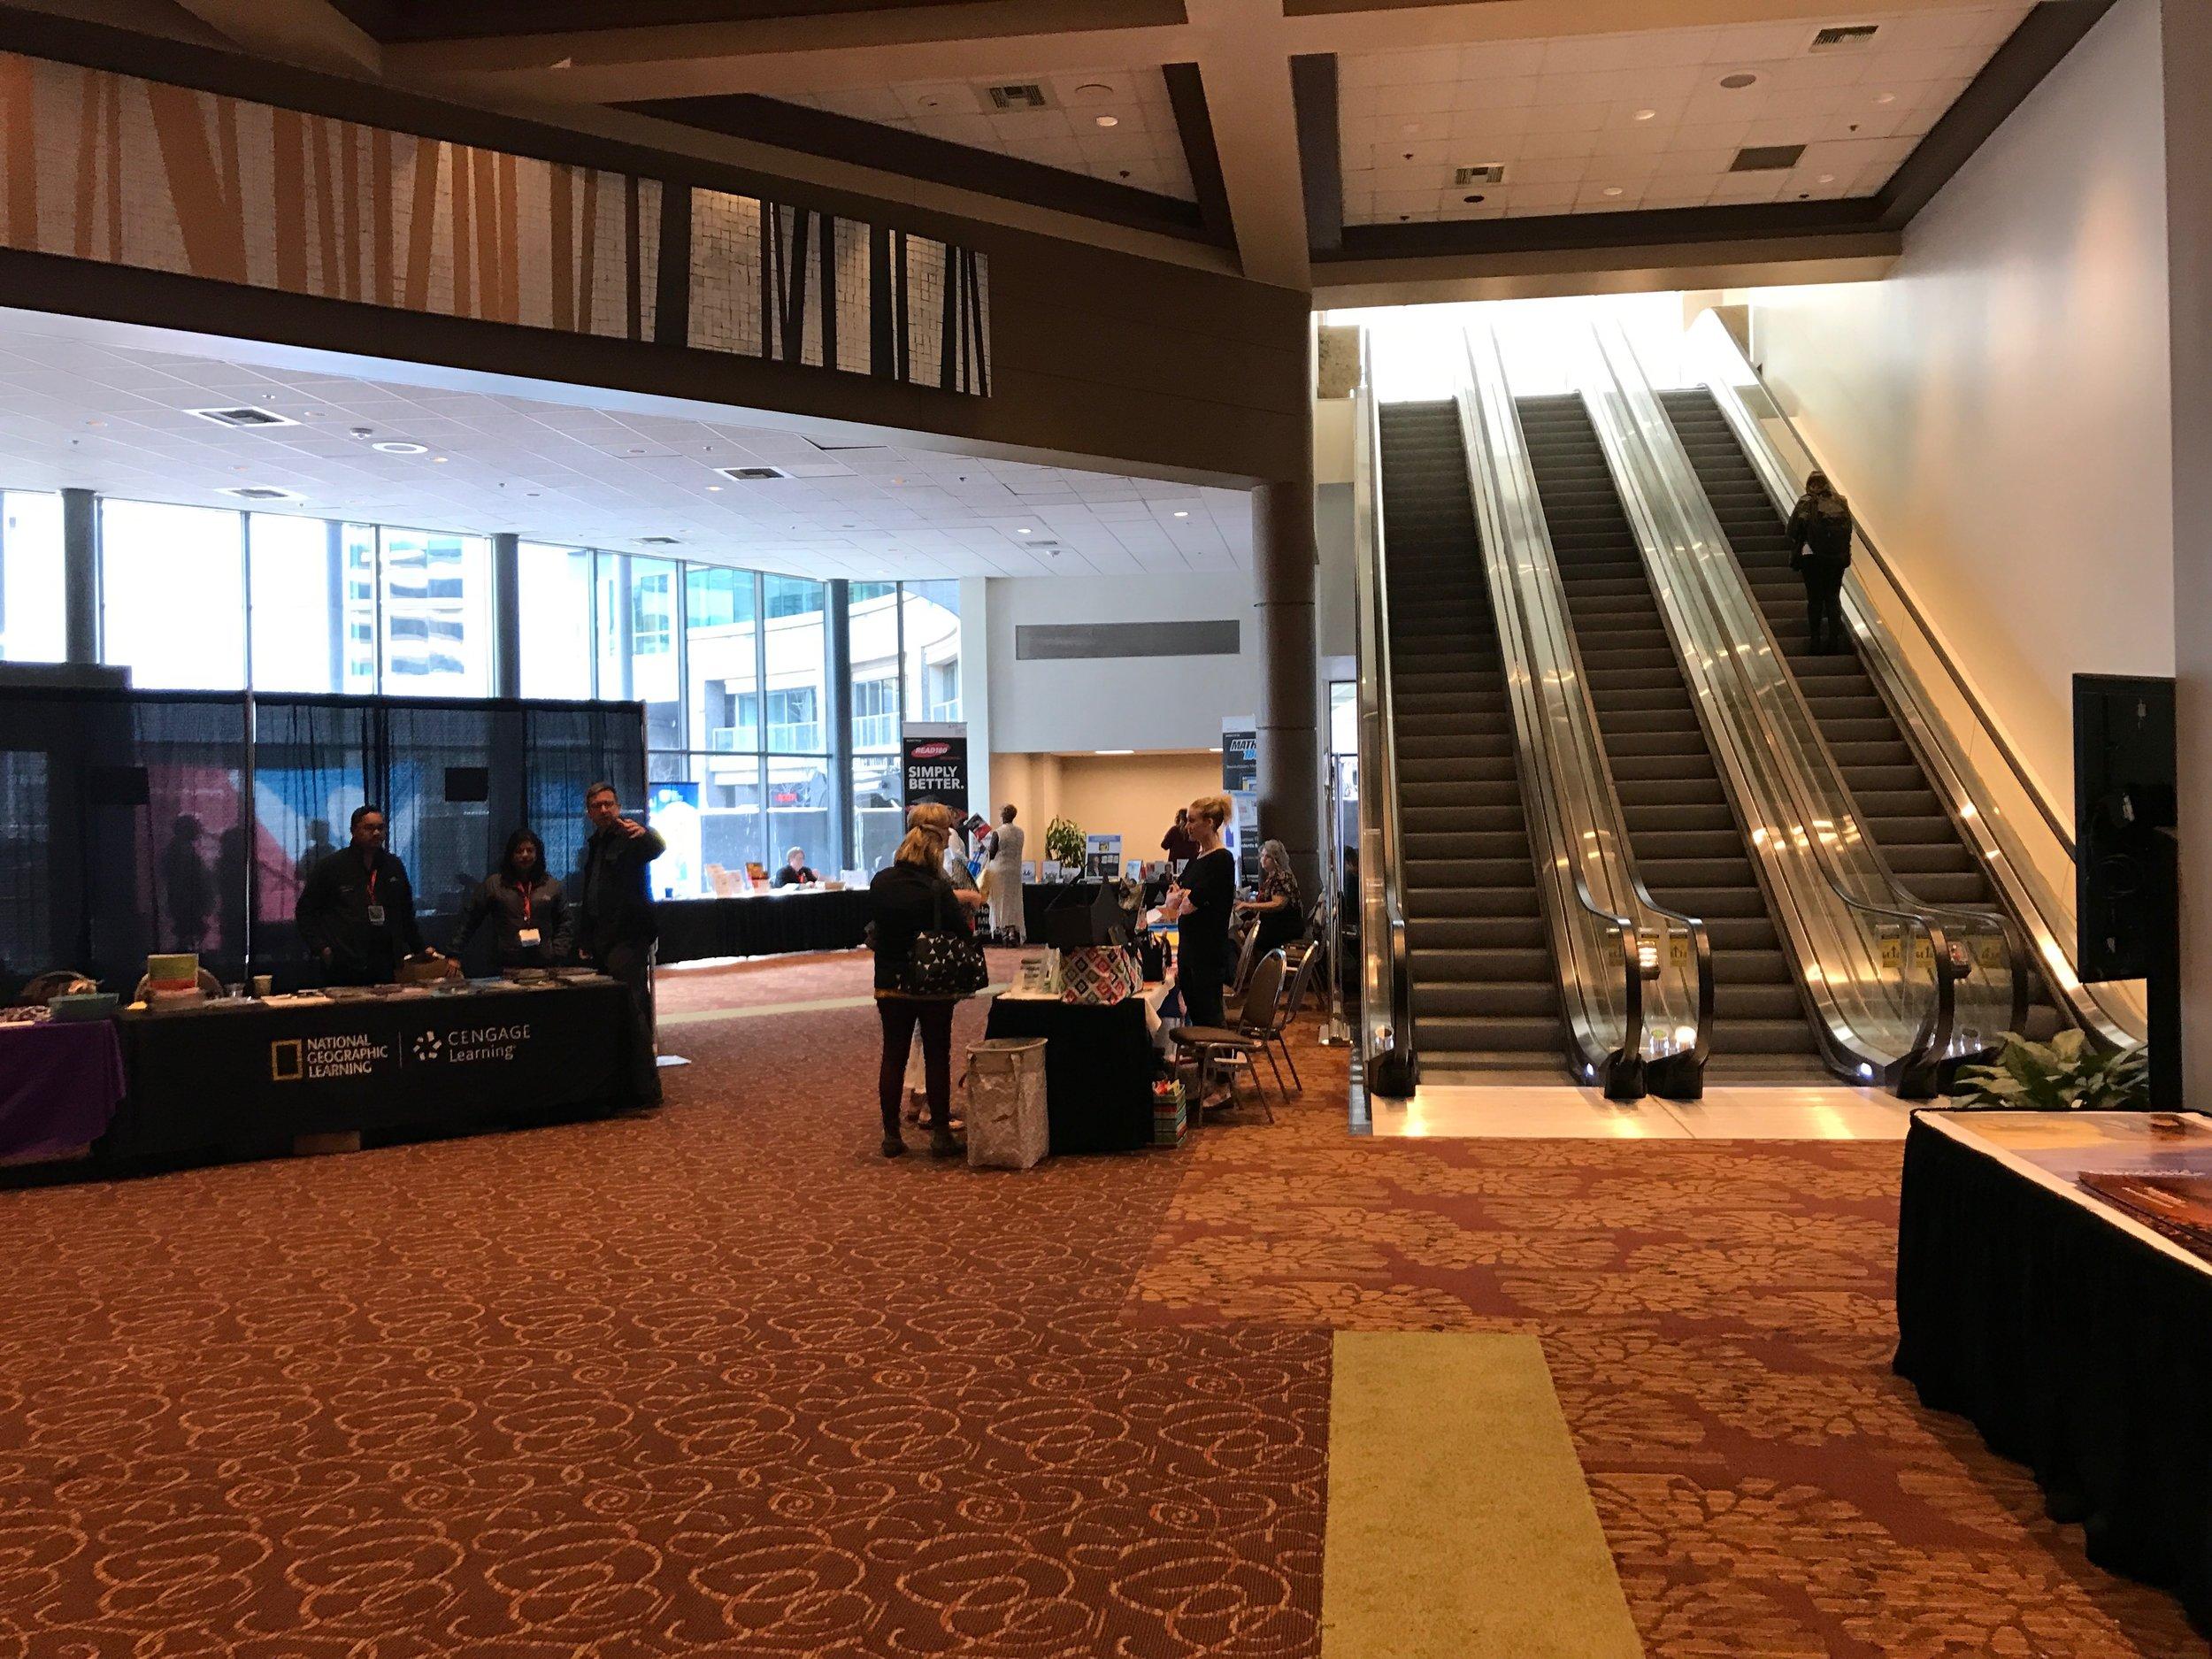 View towards esclators from original Boise Centre lobby